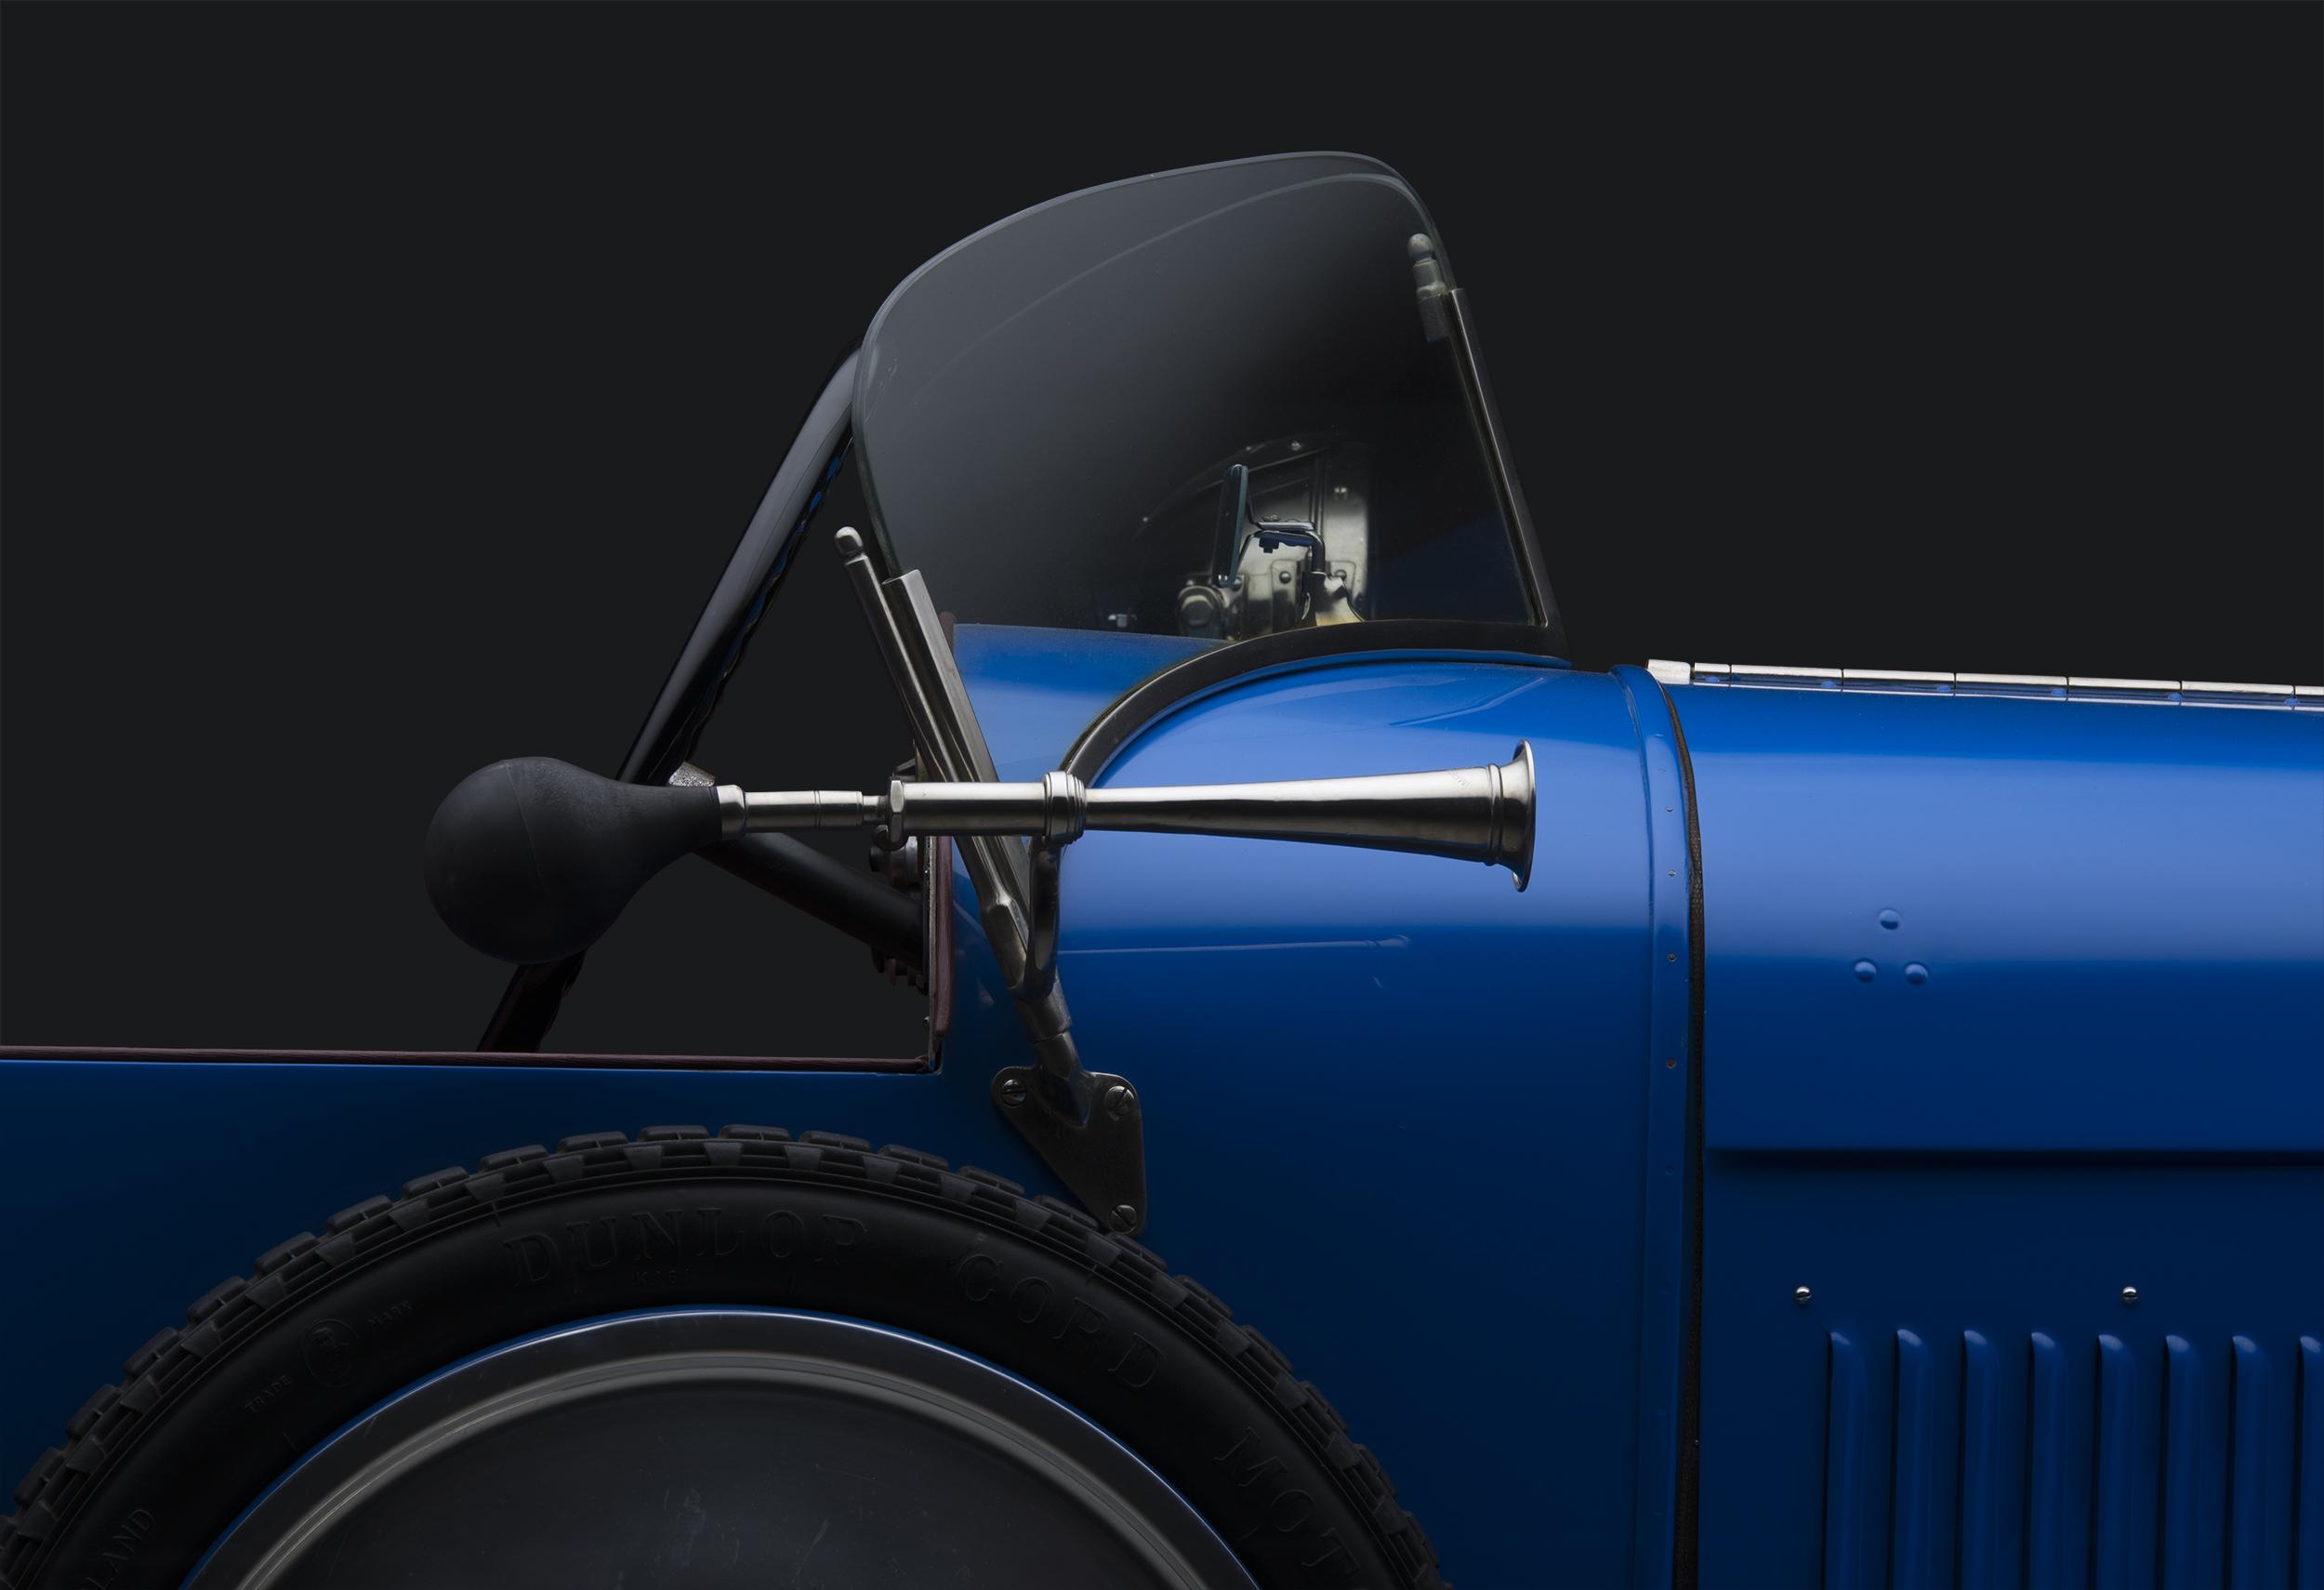 1924AmilcarDetail1Crop2.jpg